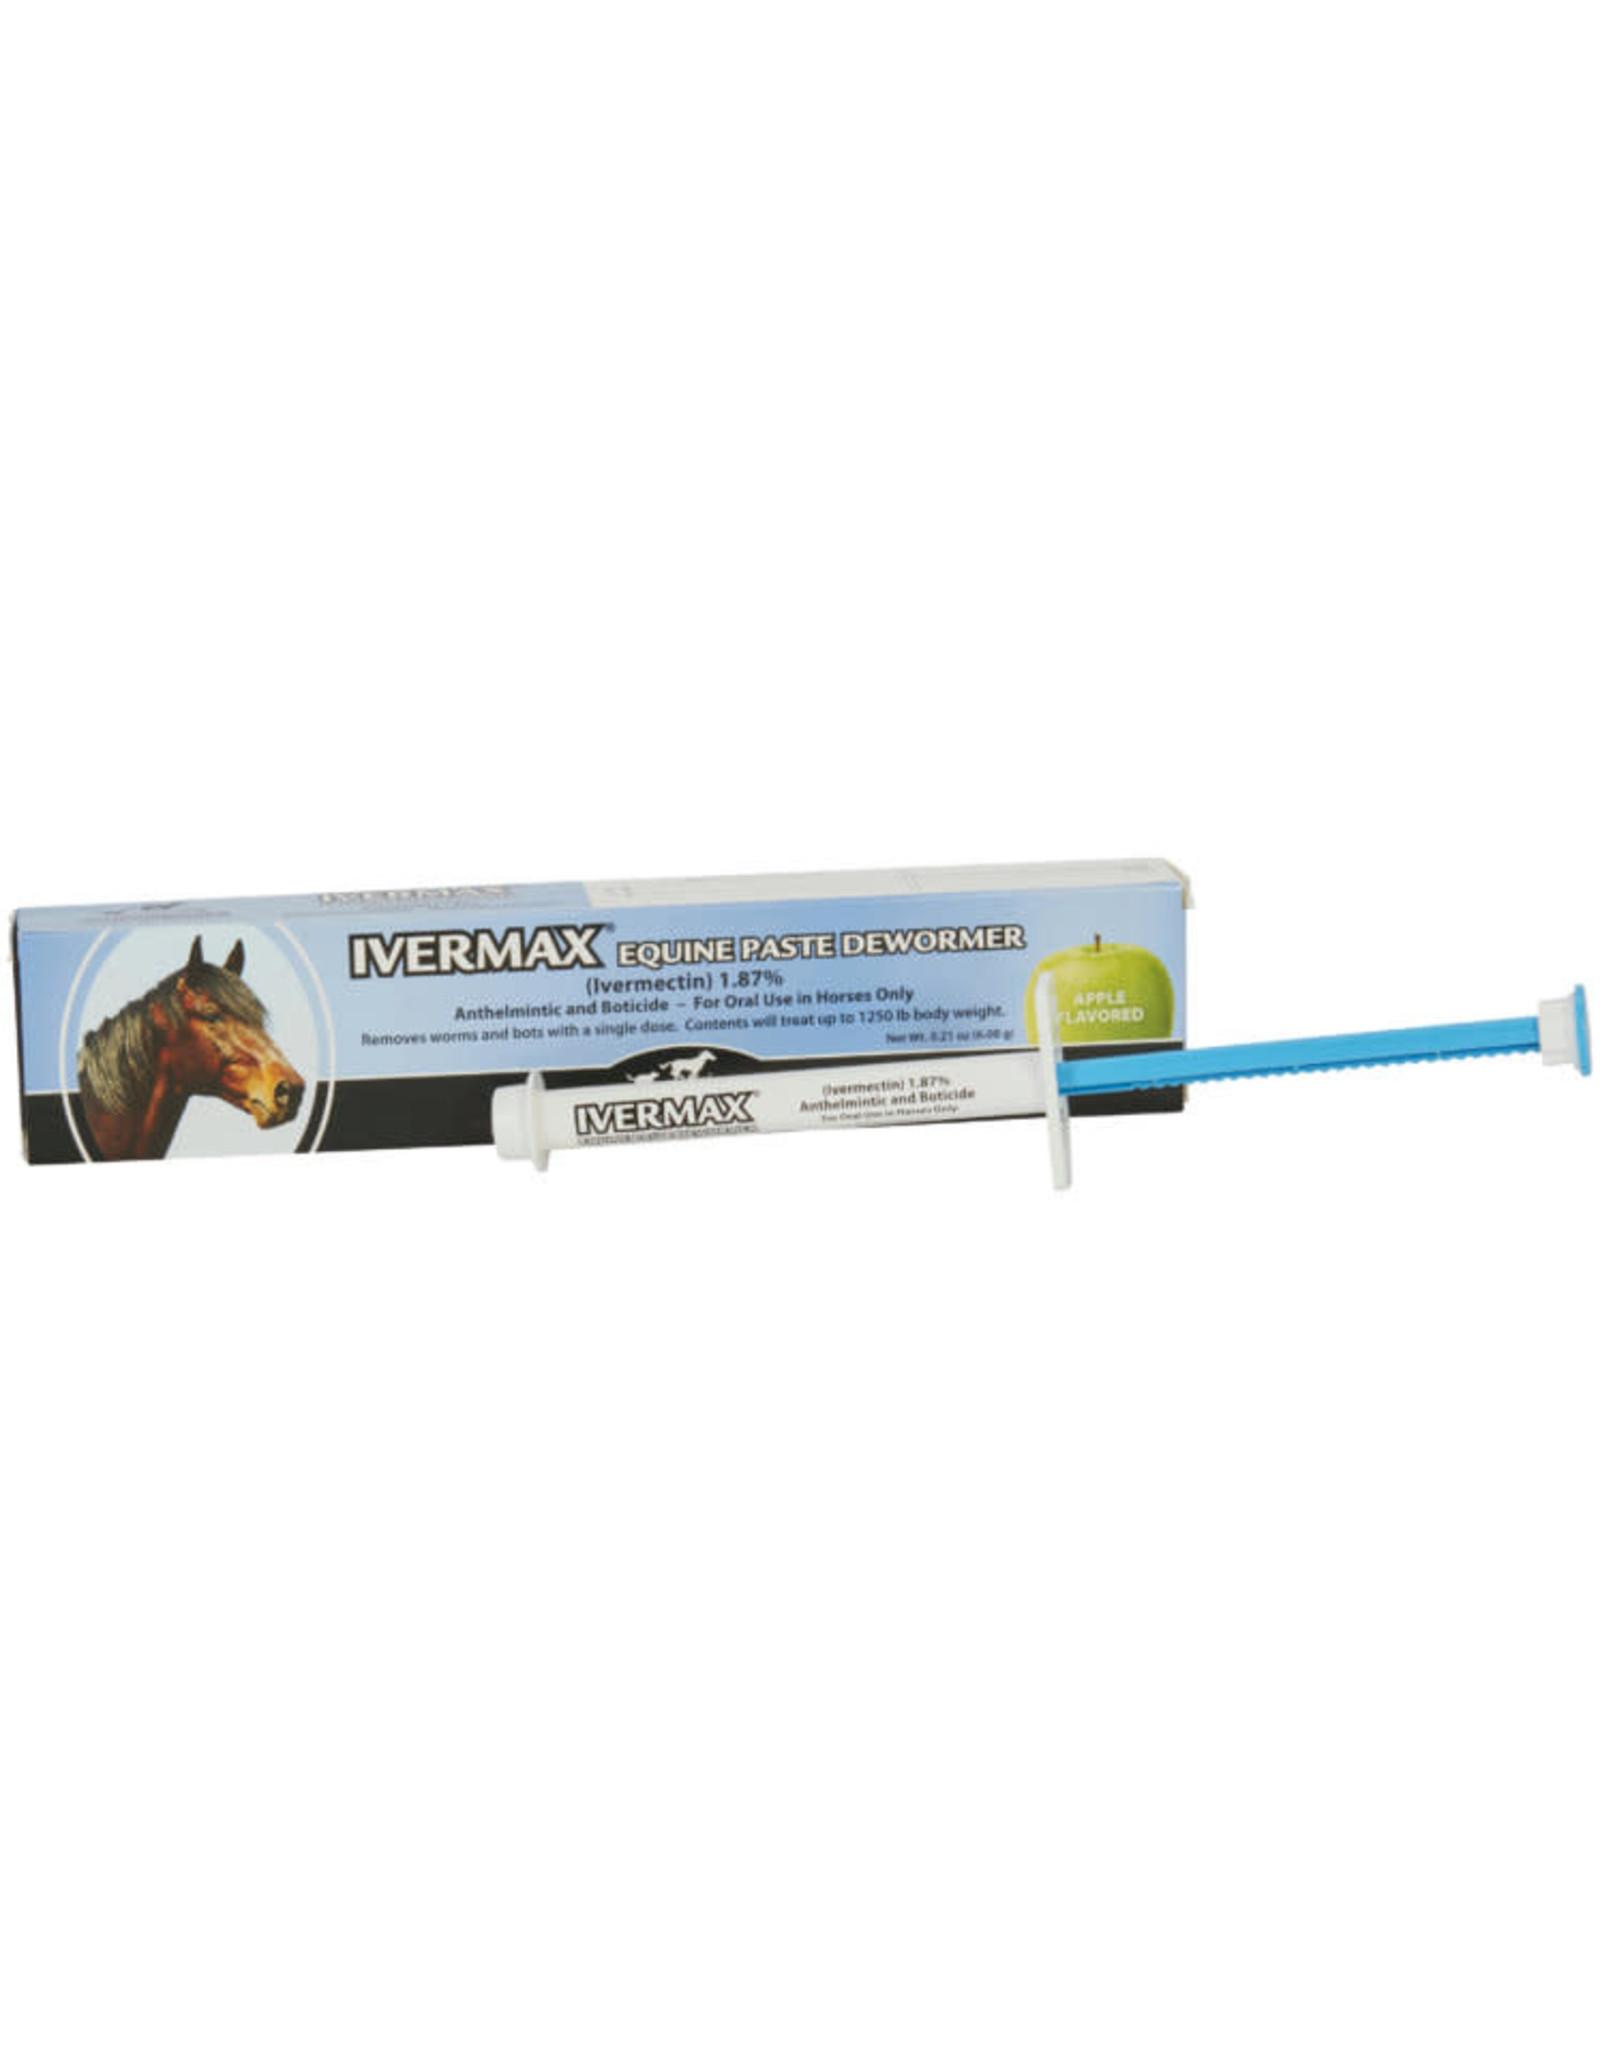 Ivermax Equine Paste